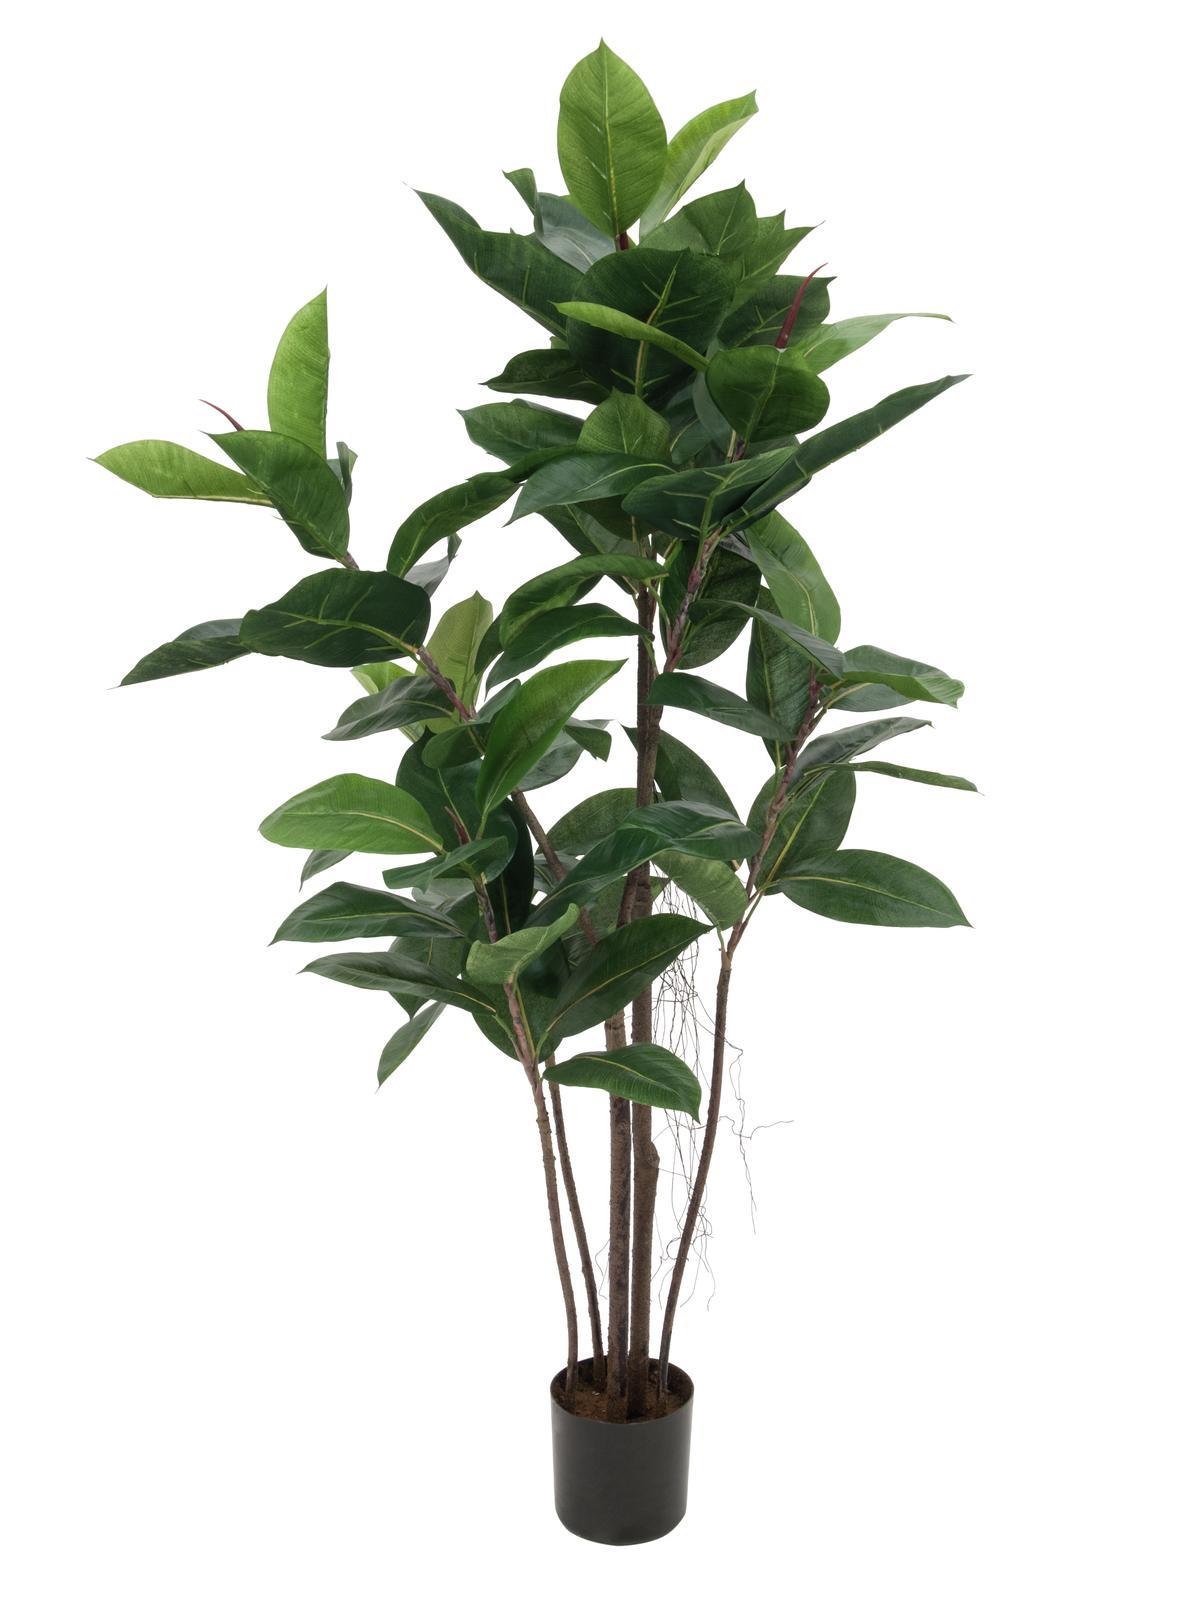 EUROPALMS Gummibaum, Kunstpflanze, 120cm